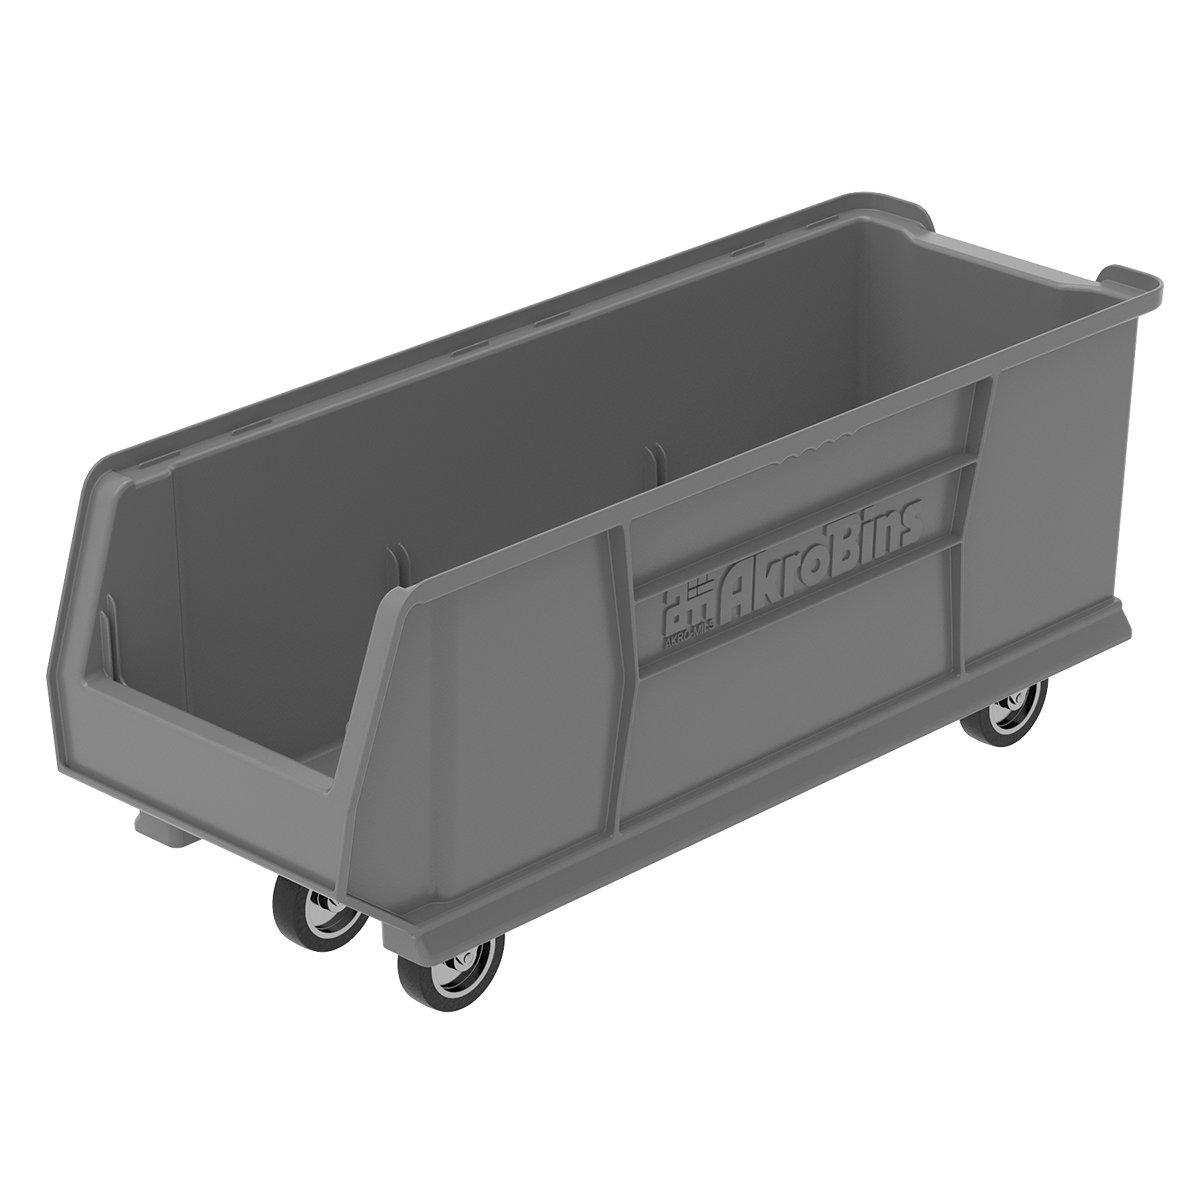 Akro-Mils 30292MOBGREY Mobile Super Size Plastic Stacking Storage Akro Bin - 30'' D x 11'' W x 10'' H, Grey, Case of 4